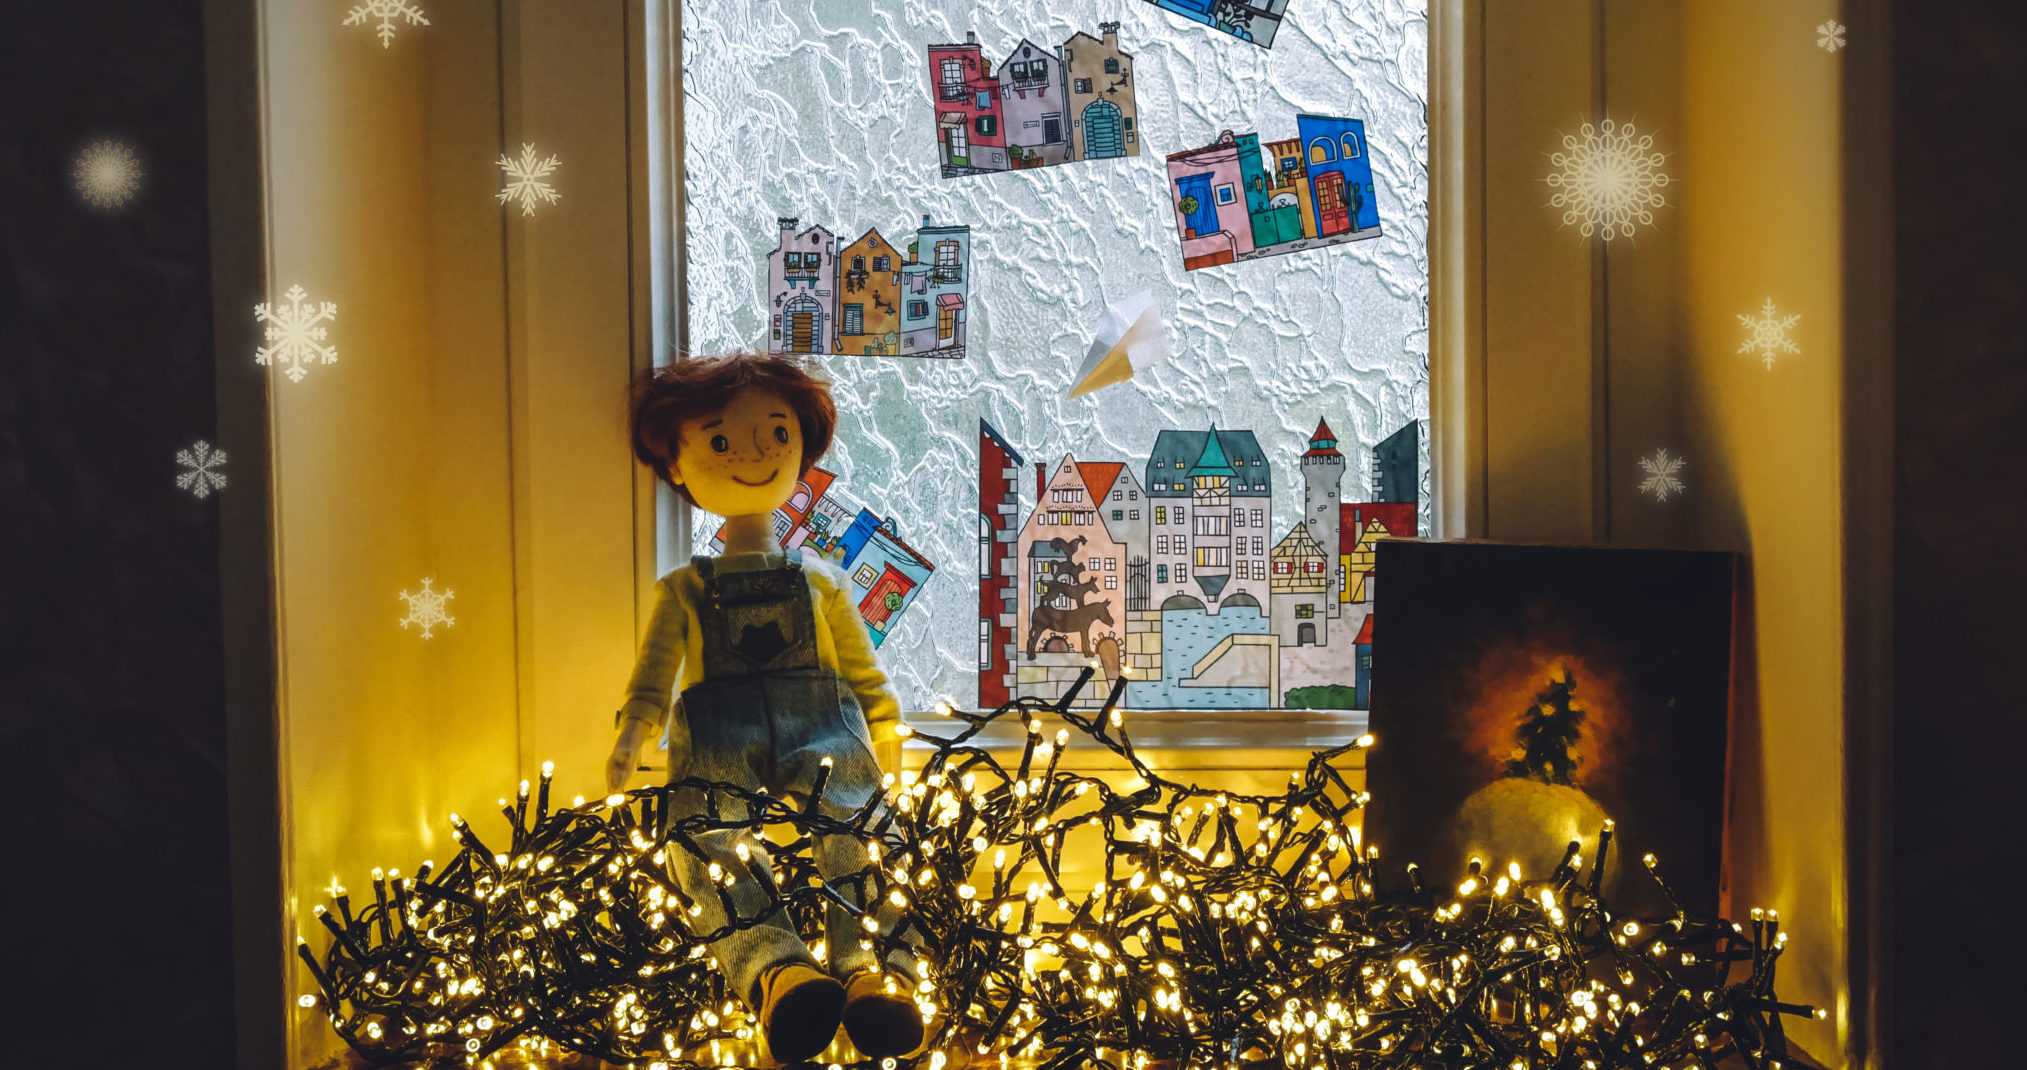 3. Вилли спасает Деда Мороза